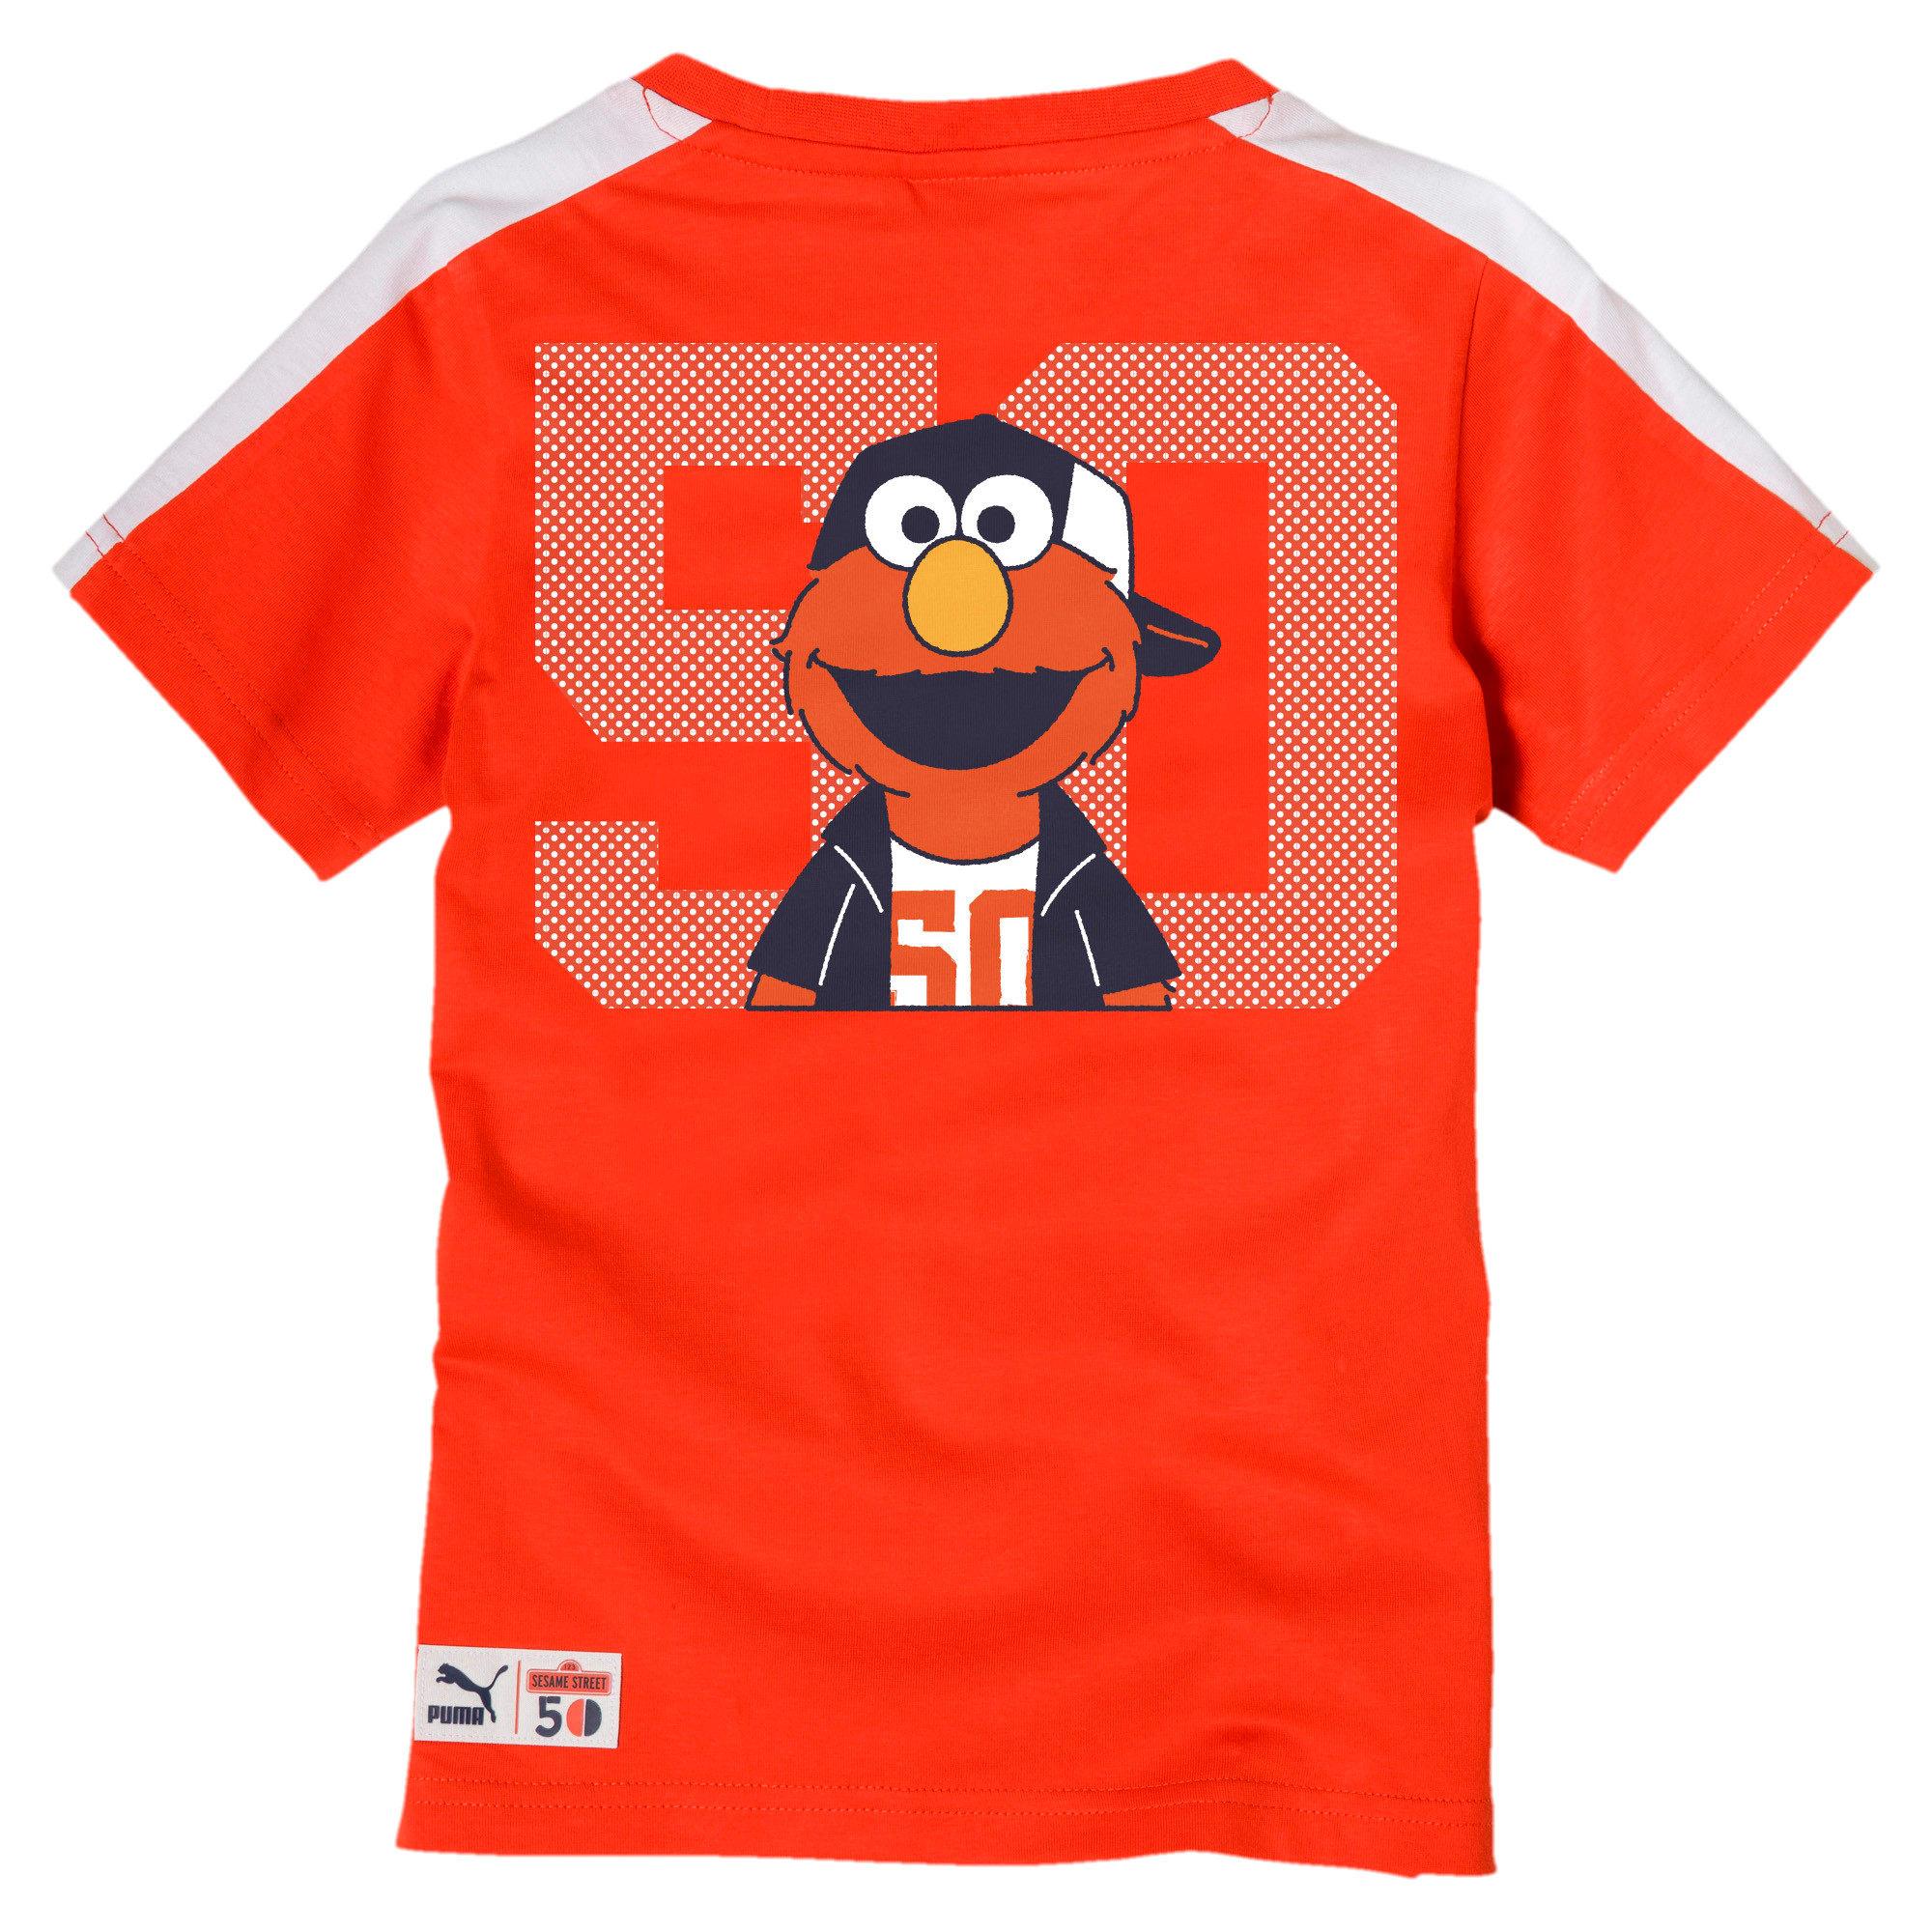 Miniatura 2 de Camiseta PUMA x SESAME STREET para niño, Cherry Tomato-tigerlily, mediano